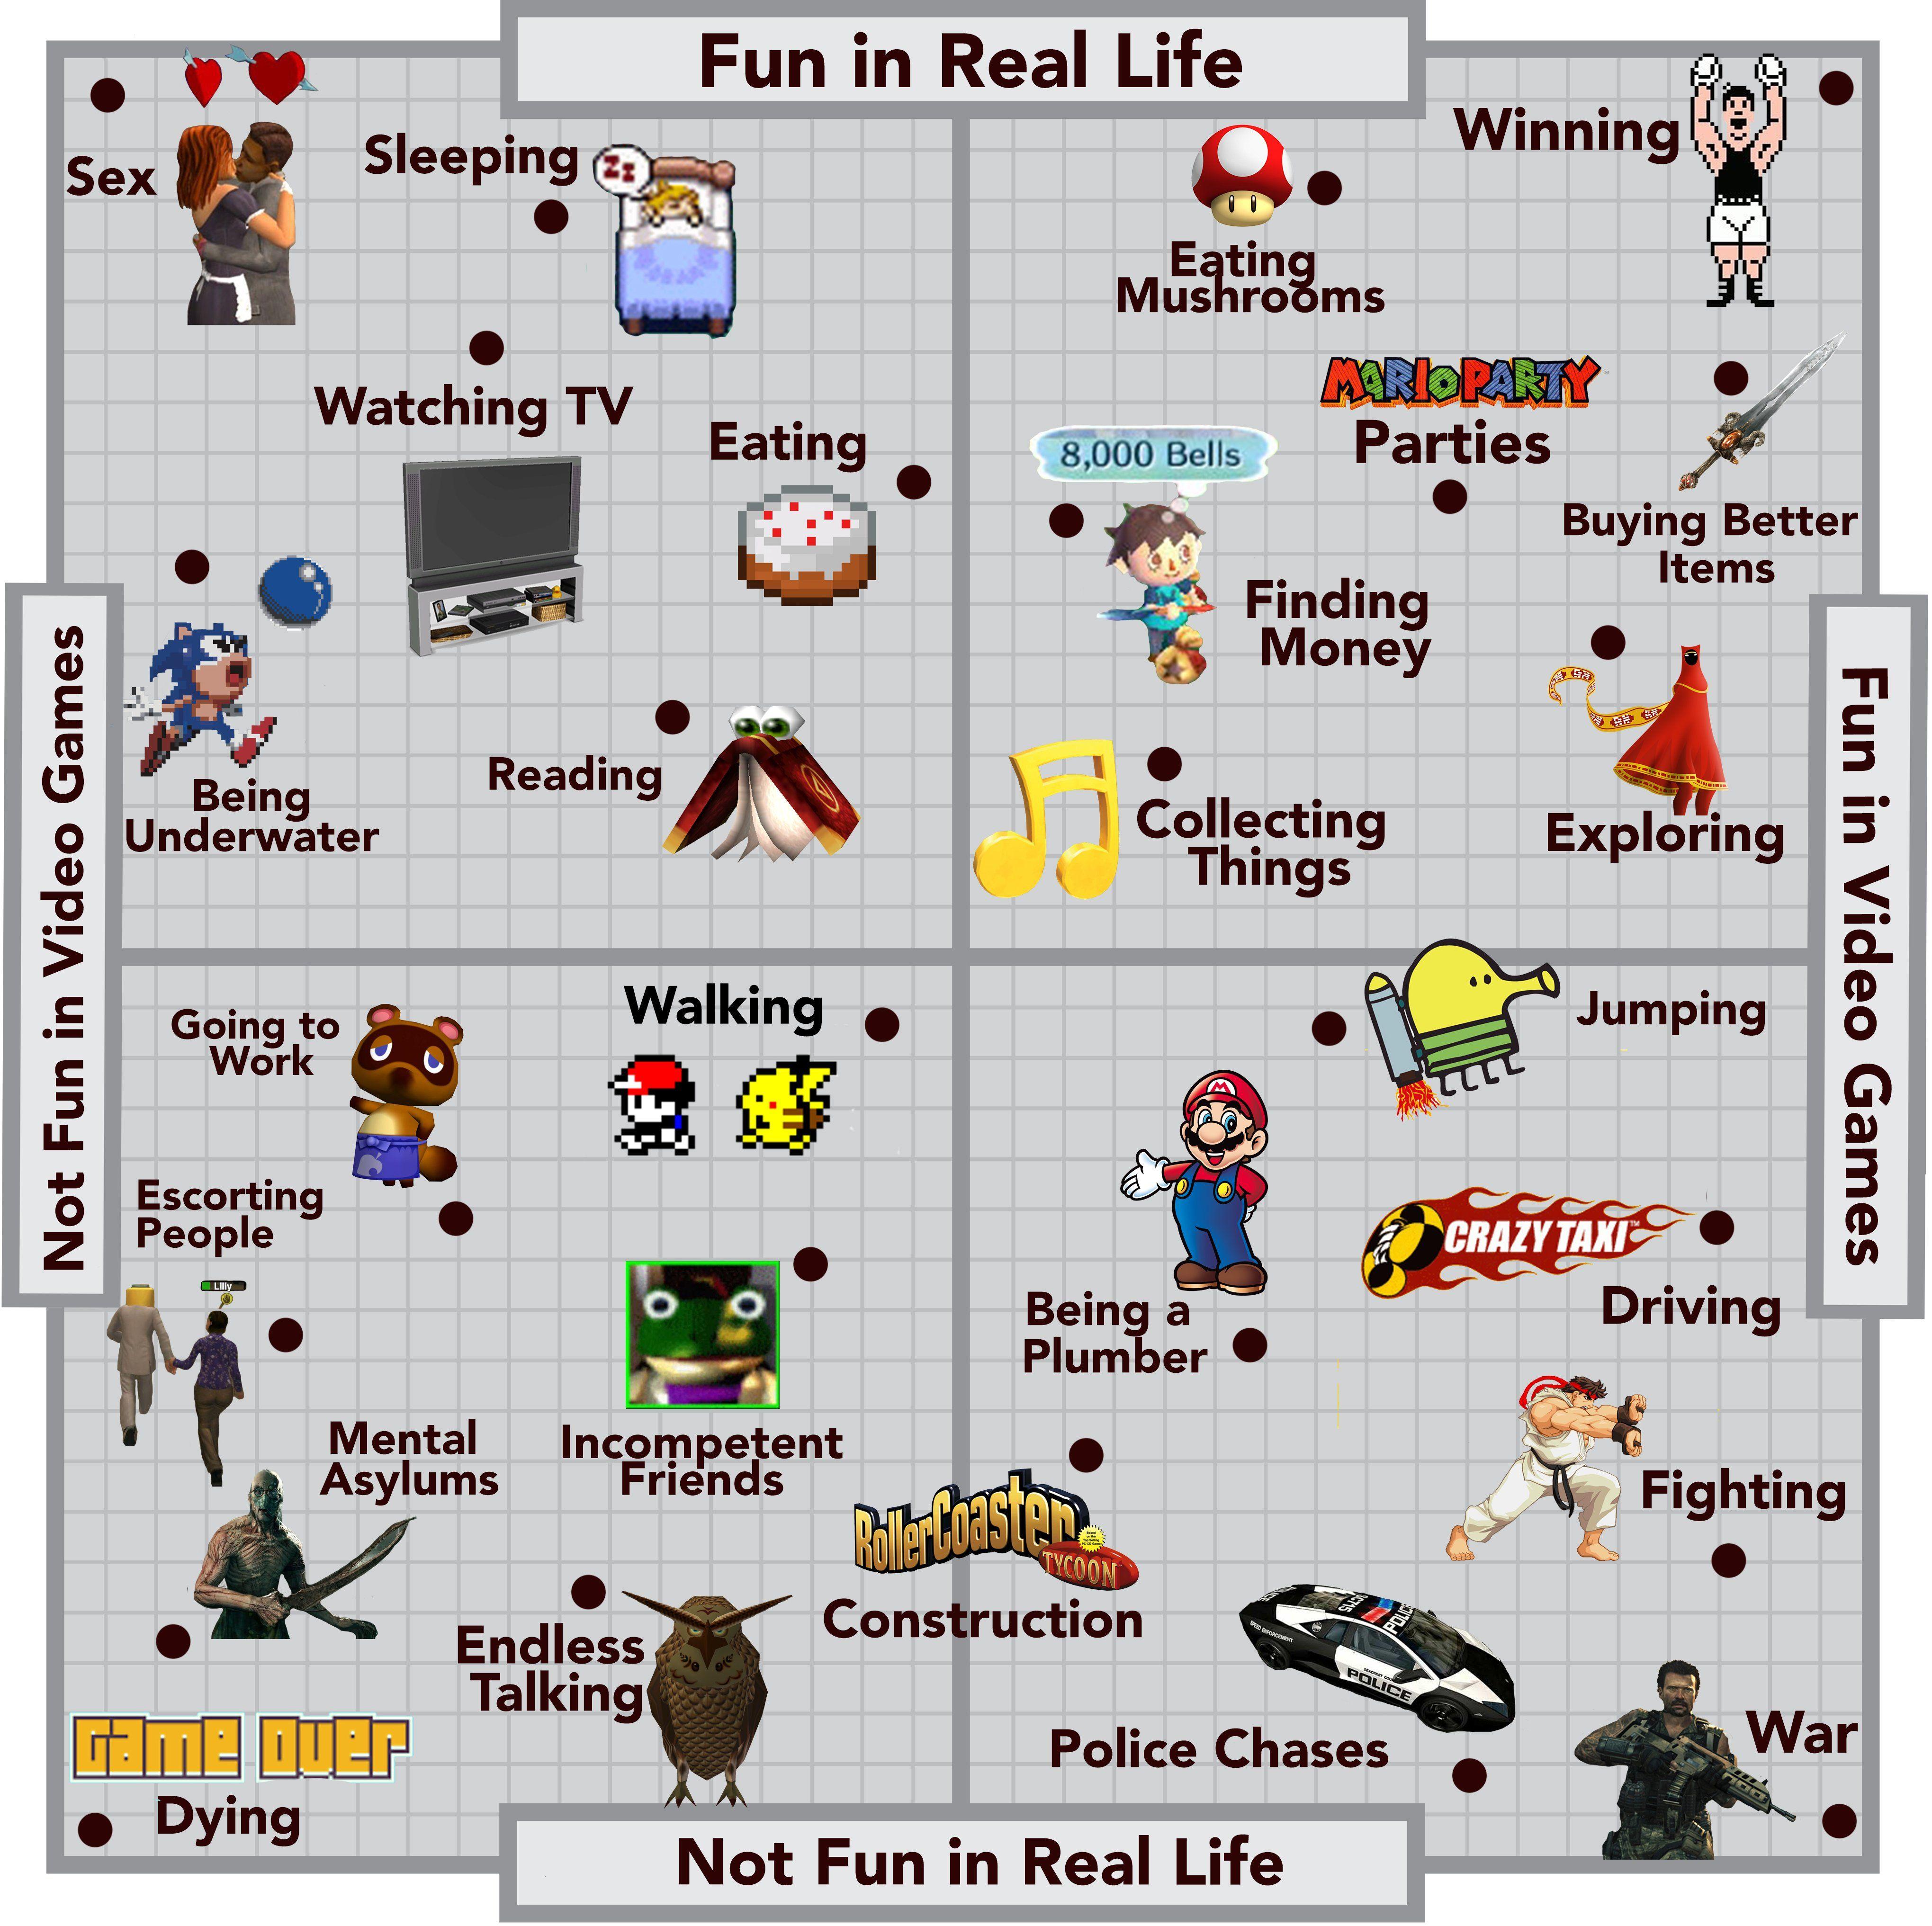 Fun chart Real life vs. Video games Fun, Games, Real life